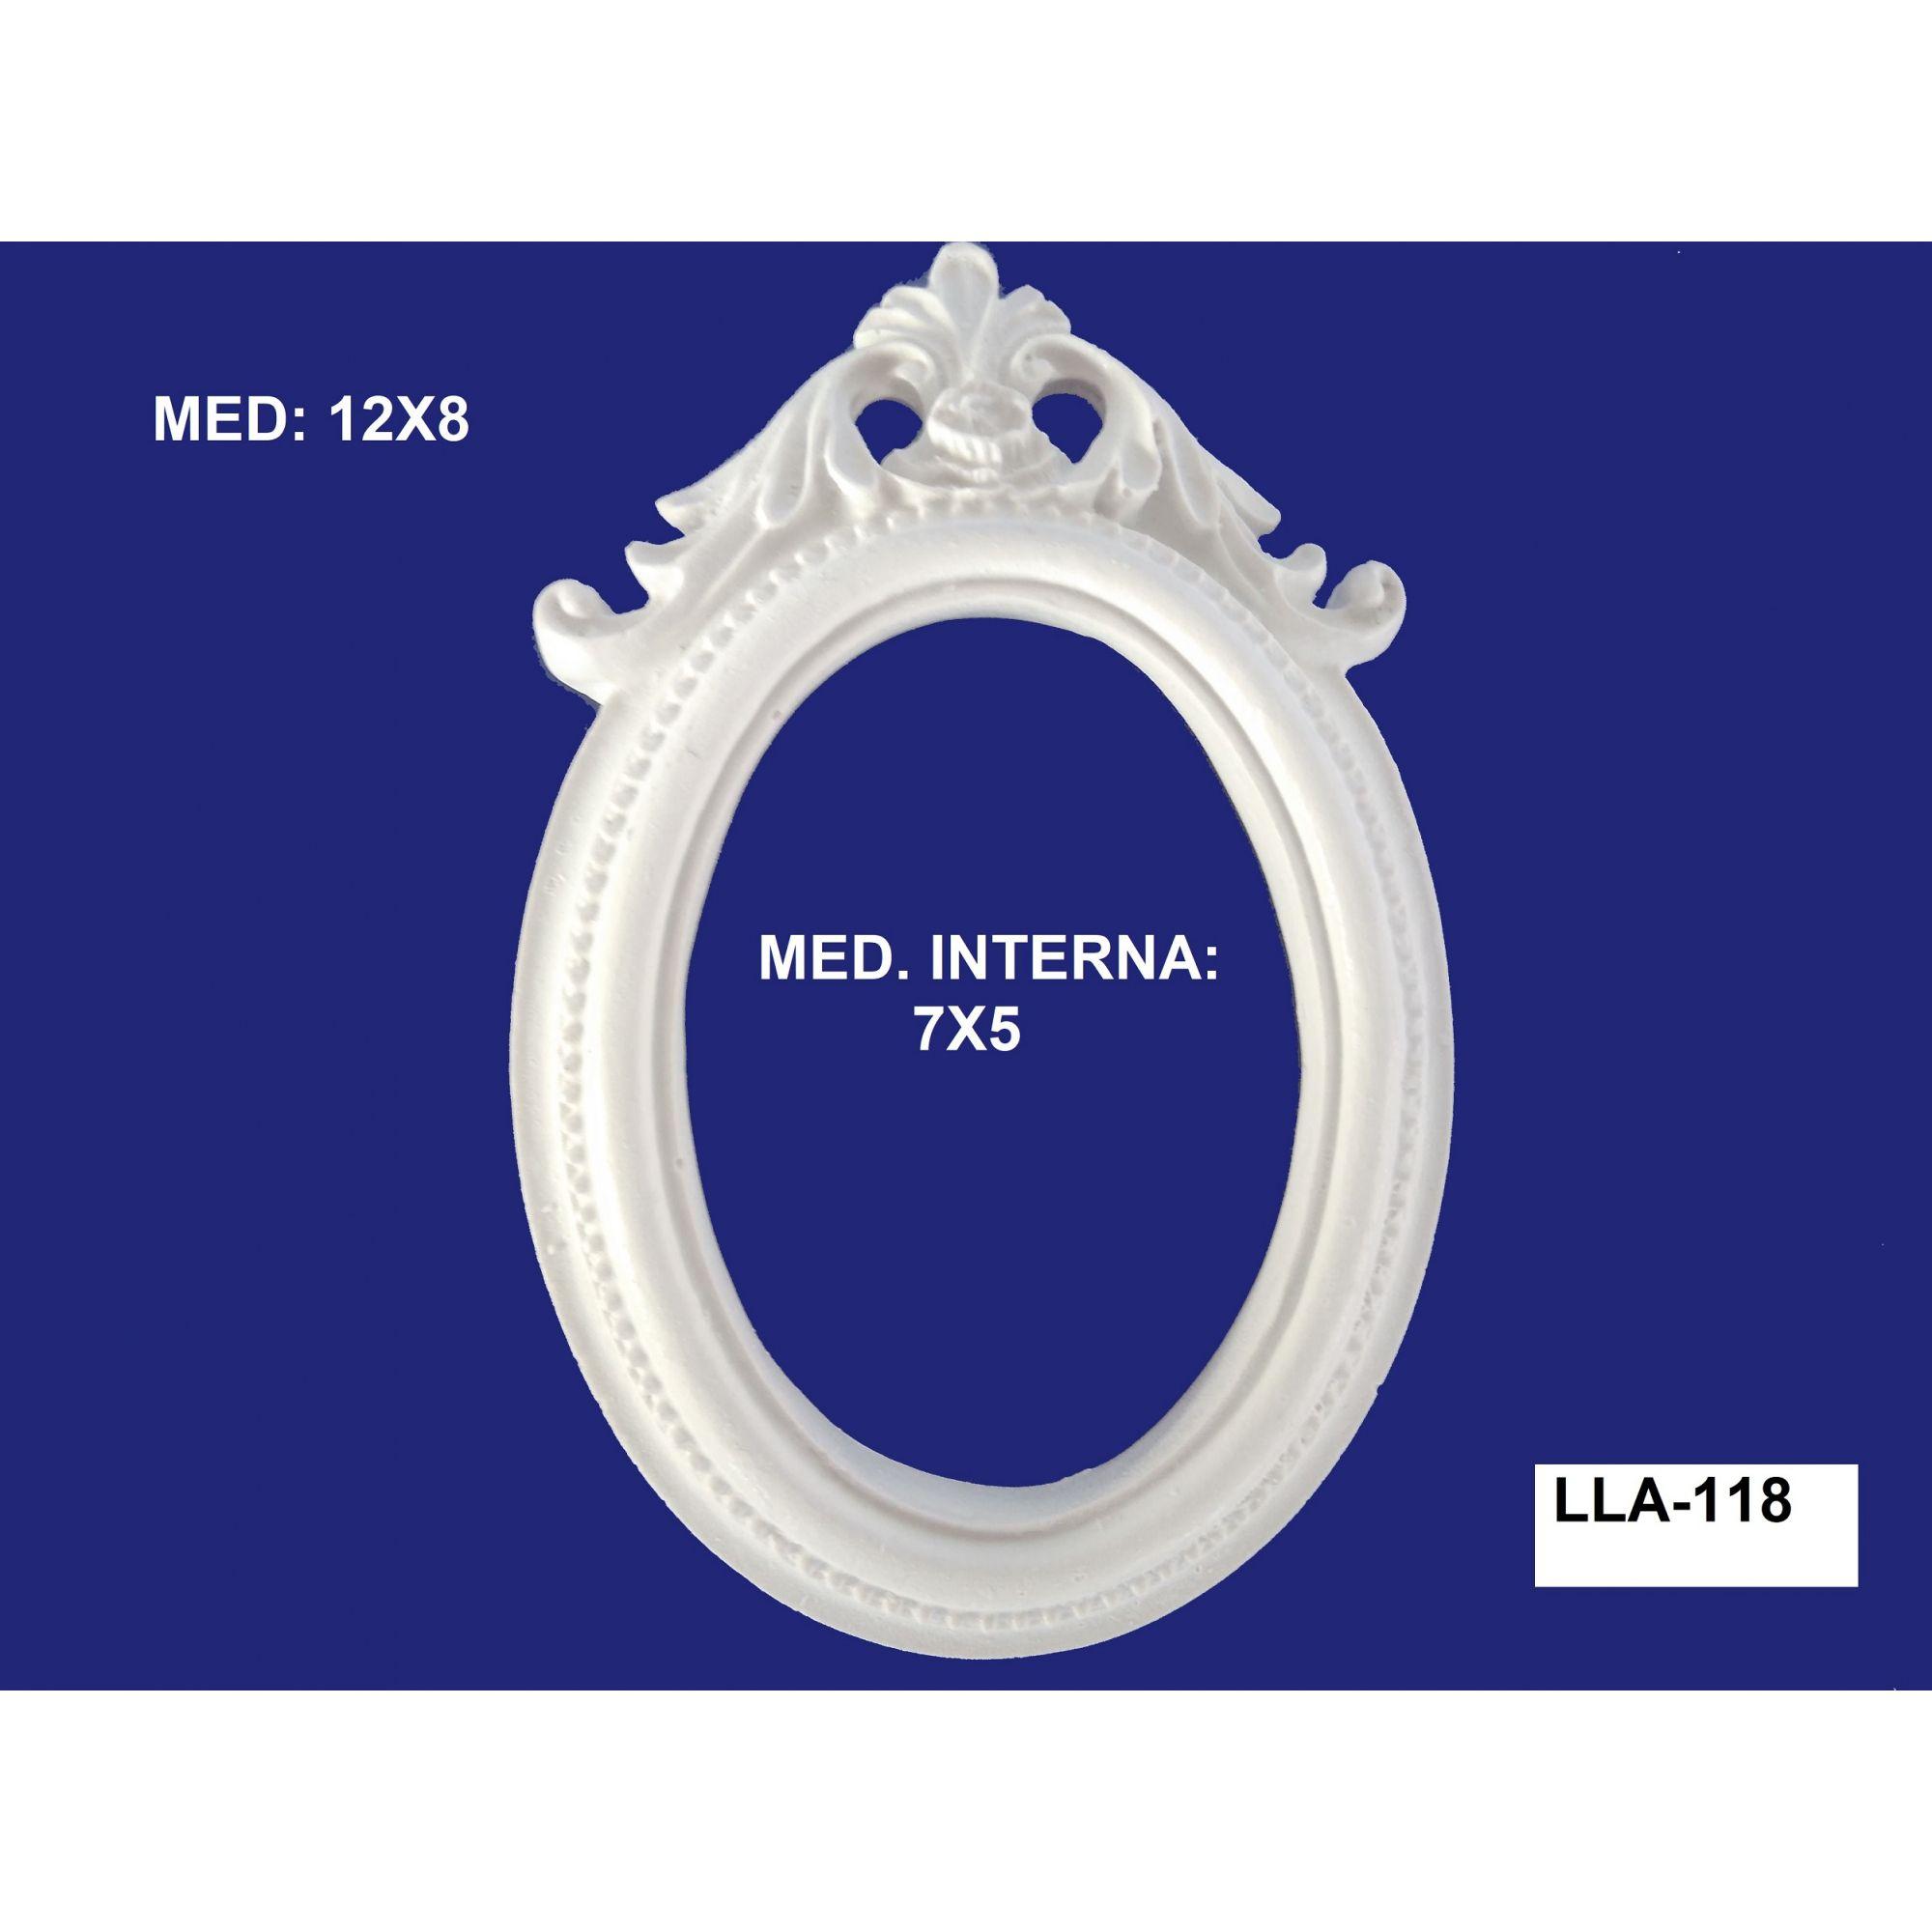 LLA-118 MOLDURA 12x08 INT: 07x05